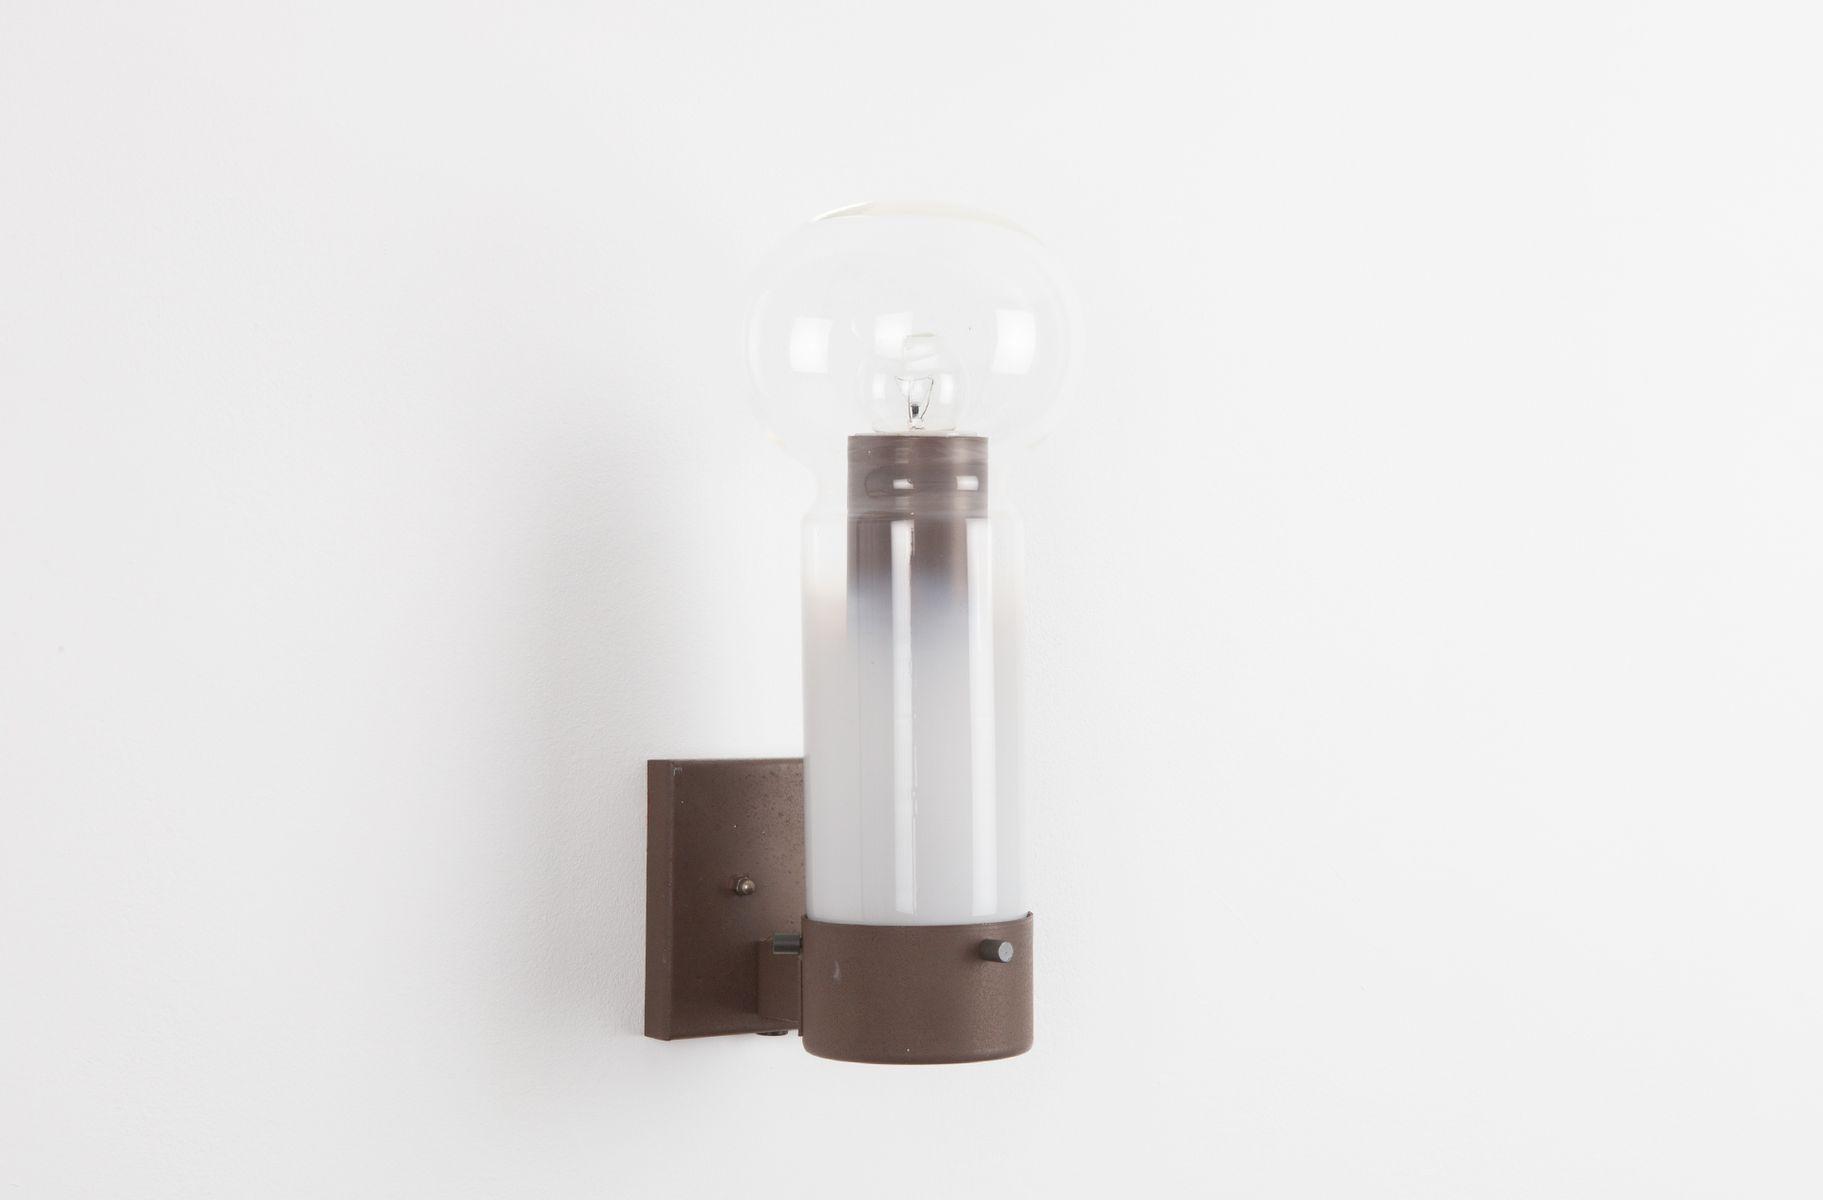 Vintage Zandloper Wandlampe von Raak